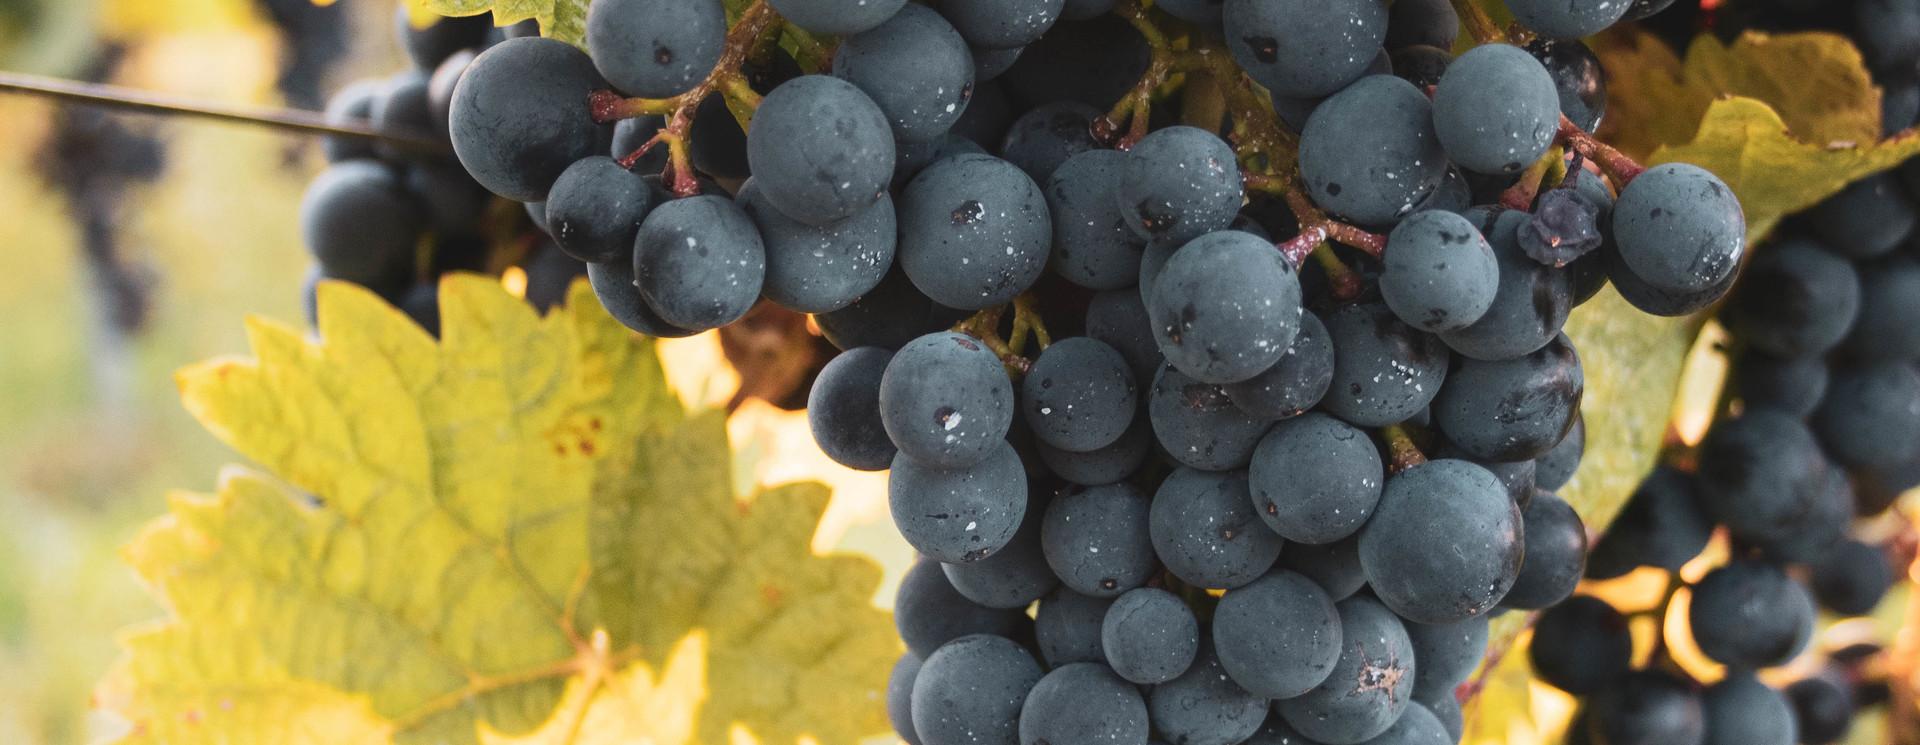 Limburgse Late Harvest wijnen